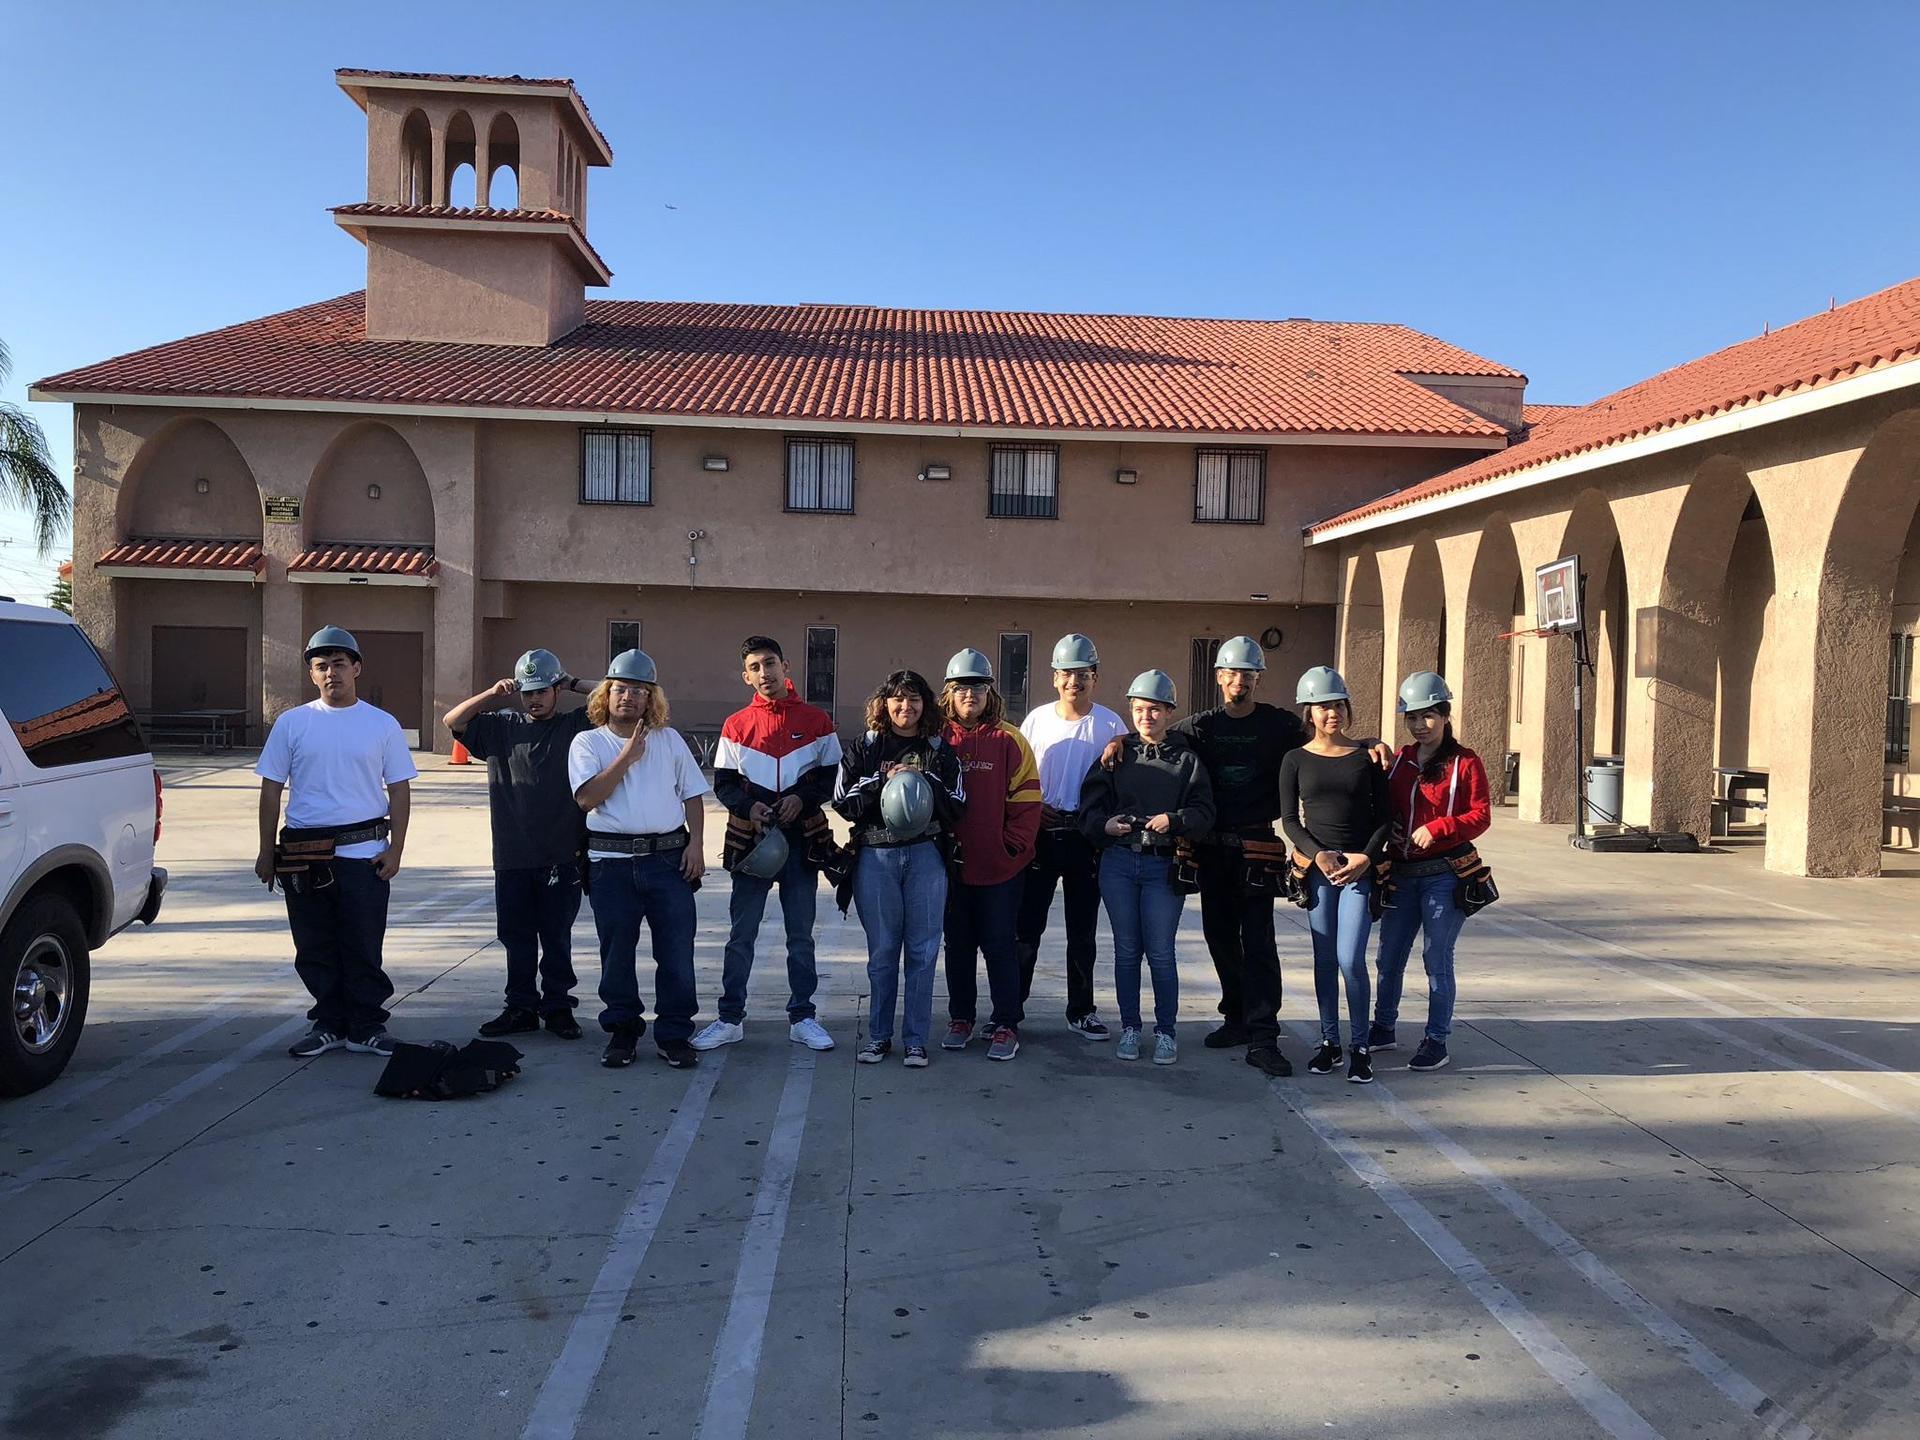 LA CAUSA construction students group shot